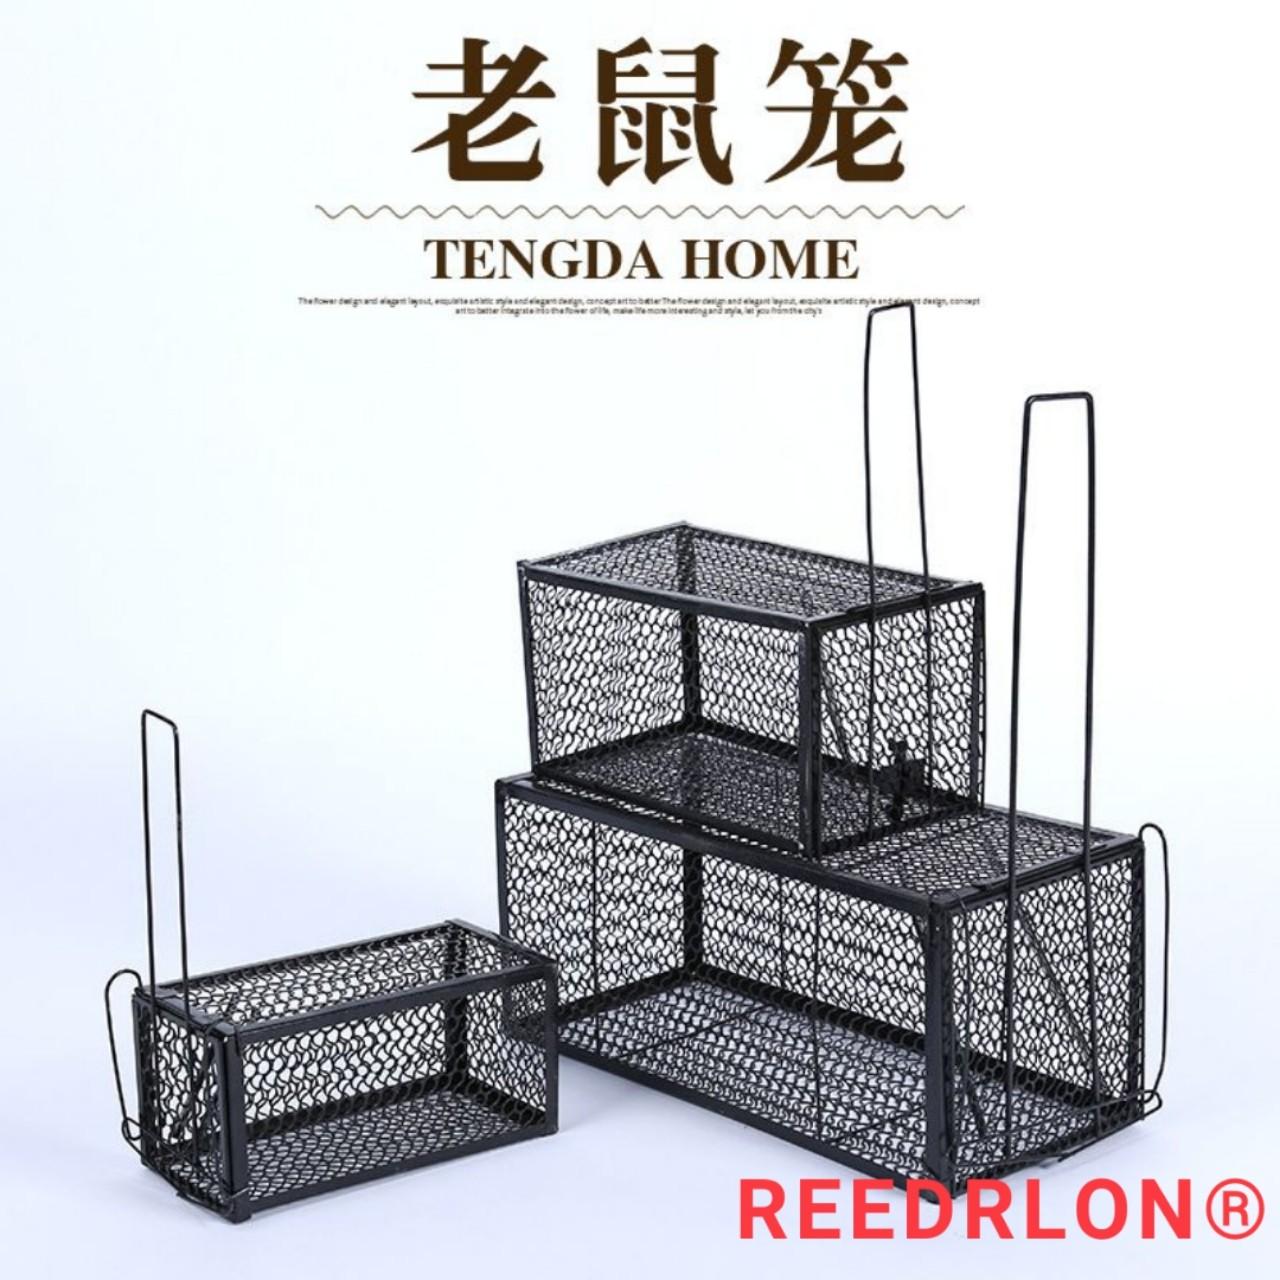 REEDRLON RATTRAP 雷德隆捕鼠笼老鼠笼子